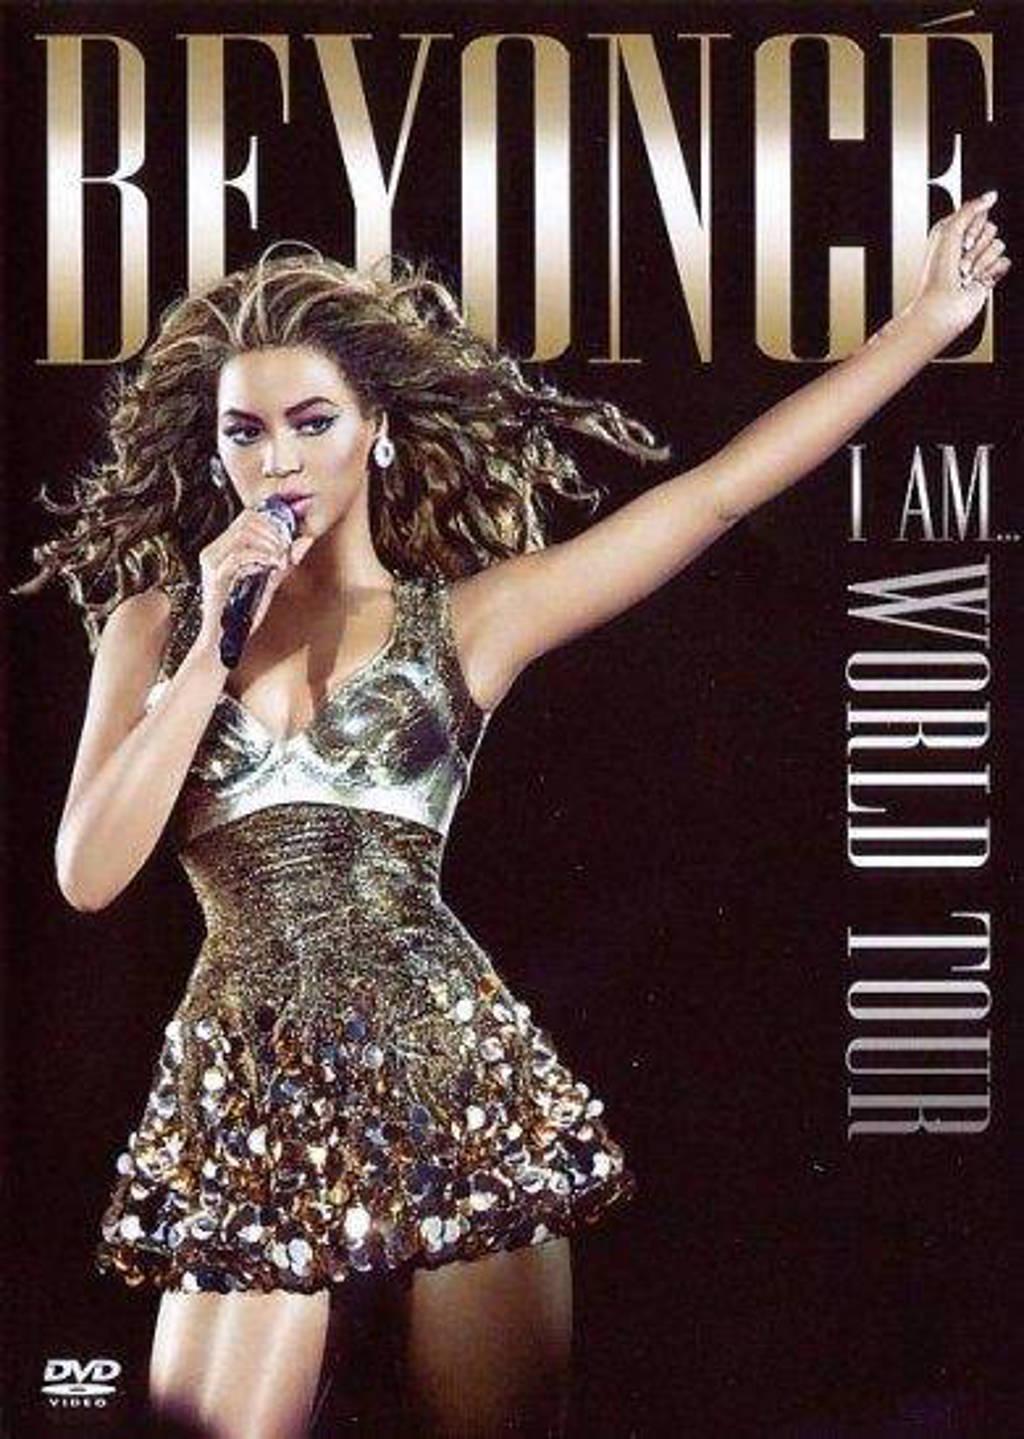 Beyonce - I Am...World Tour (DVD)